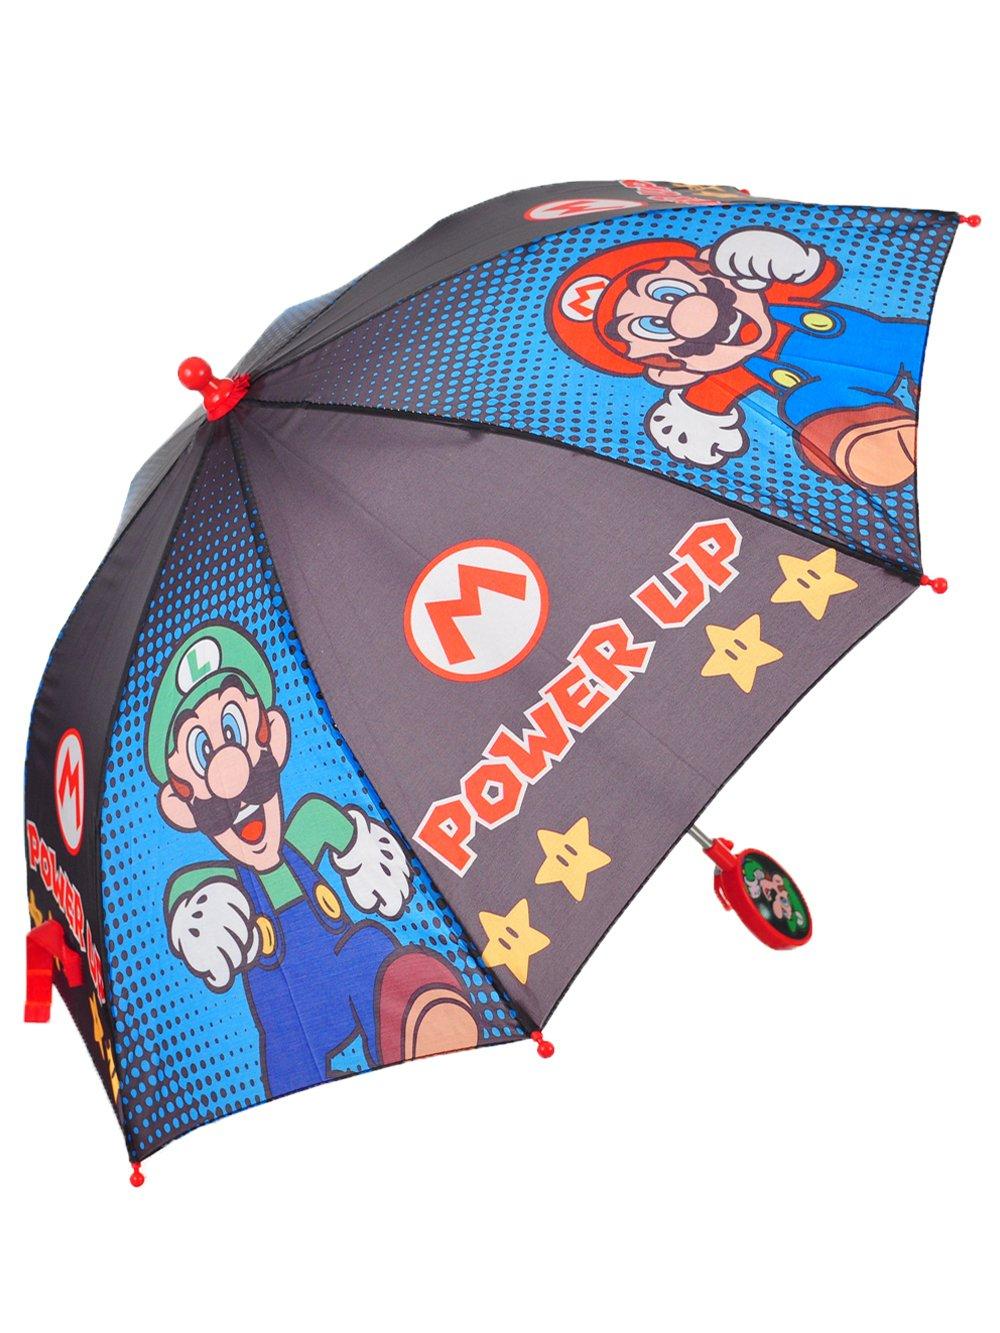 Super Mario Stick Umbrella For Girls, One Size ABG Accessories